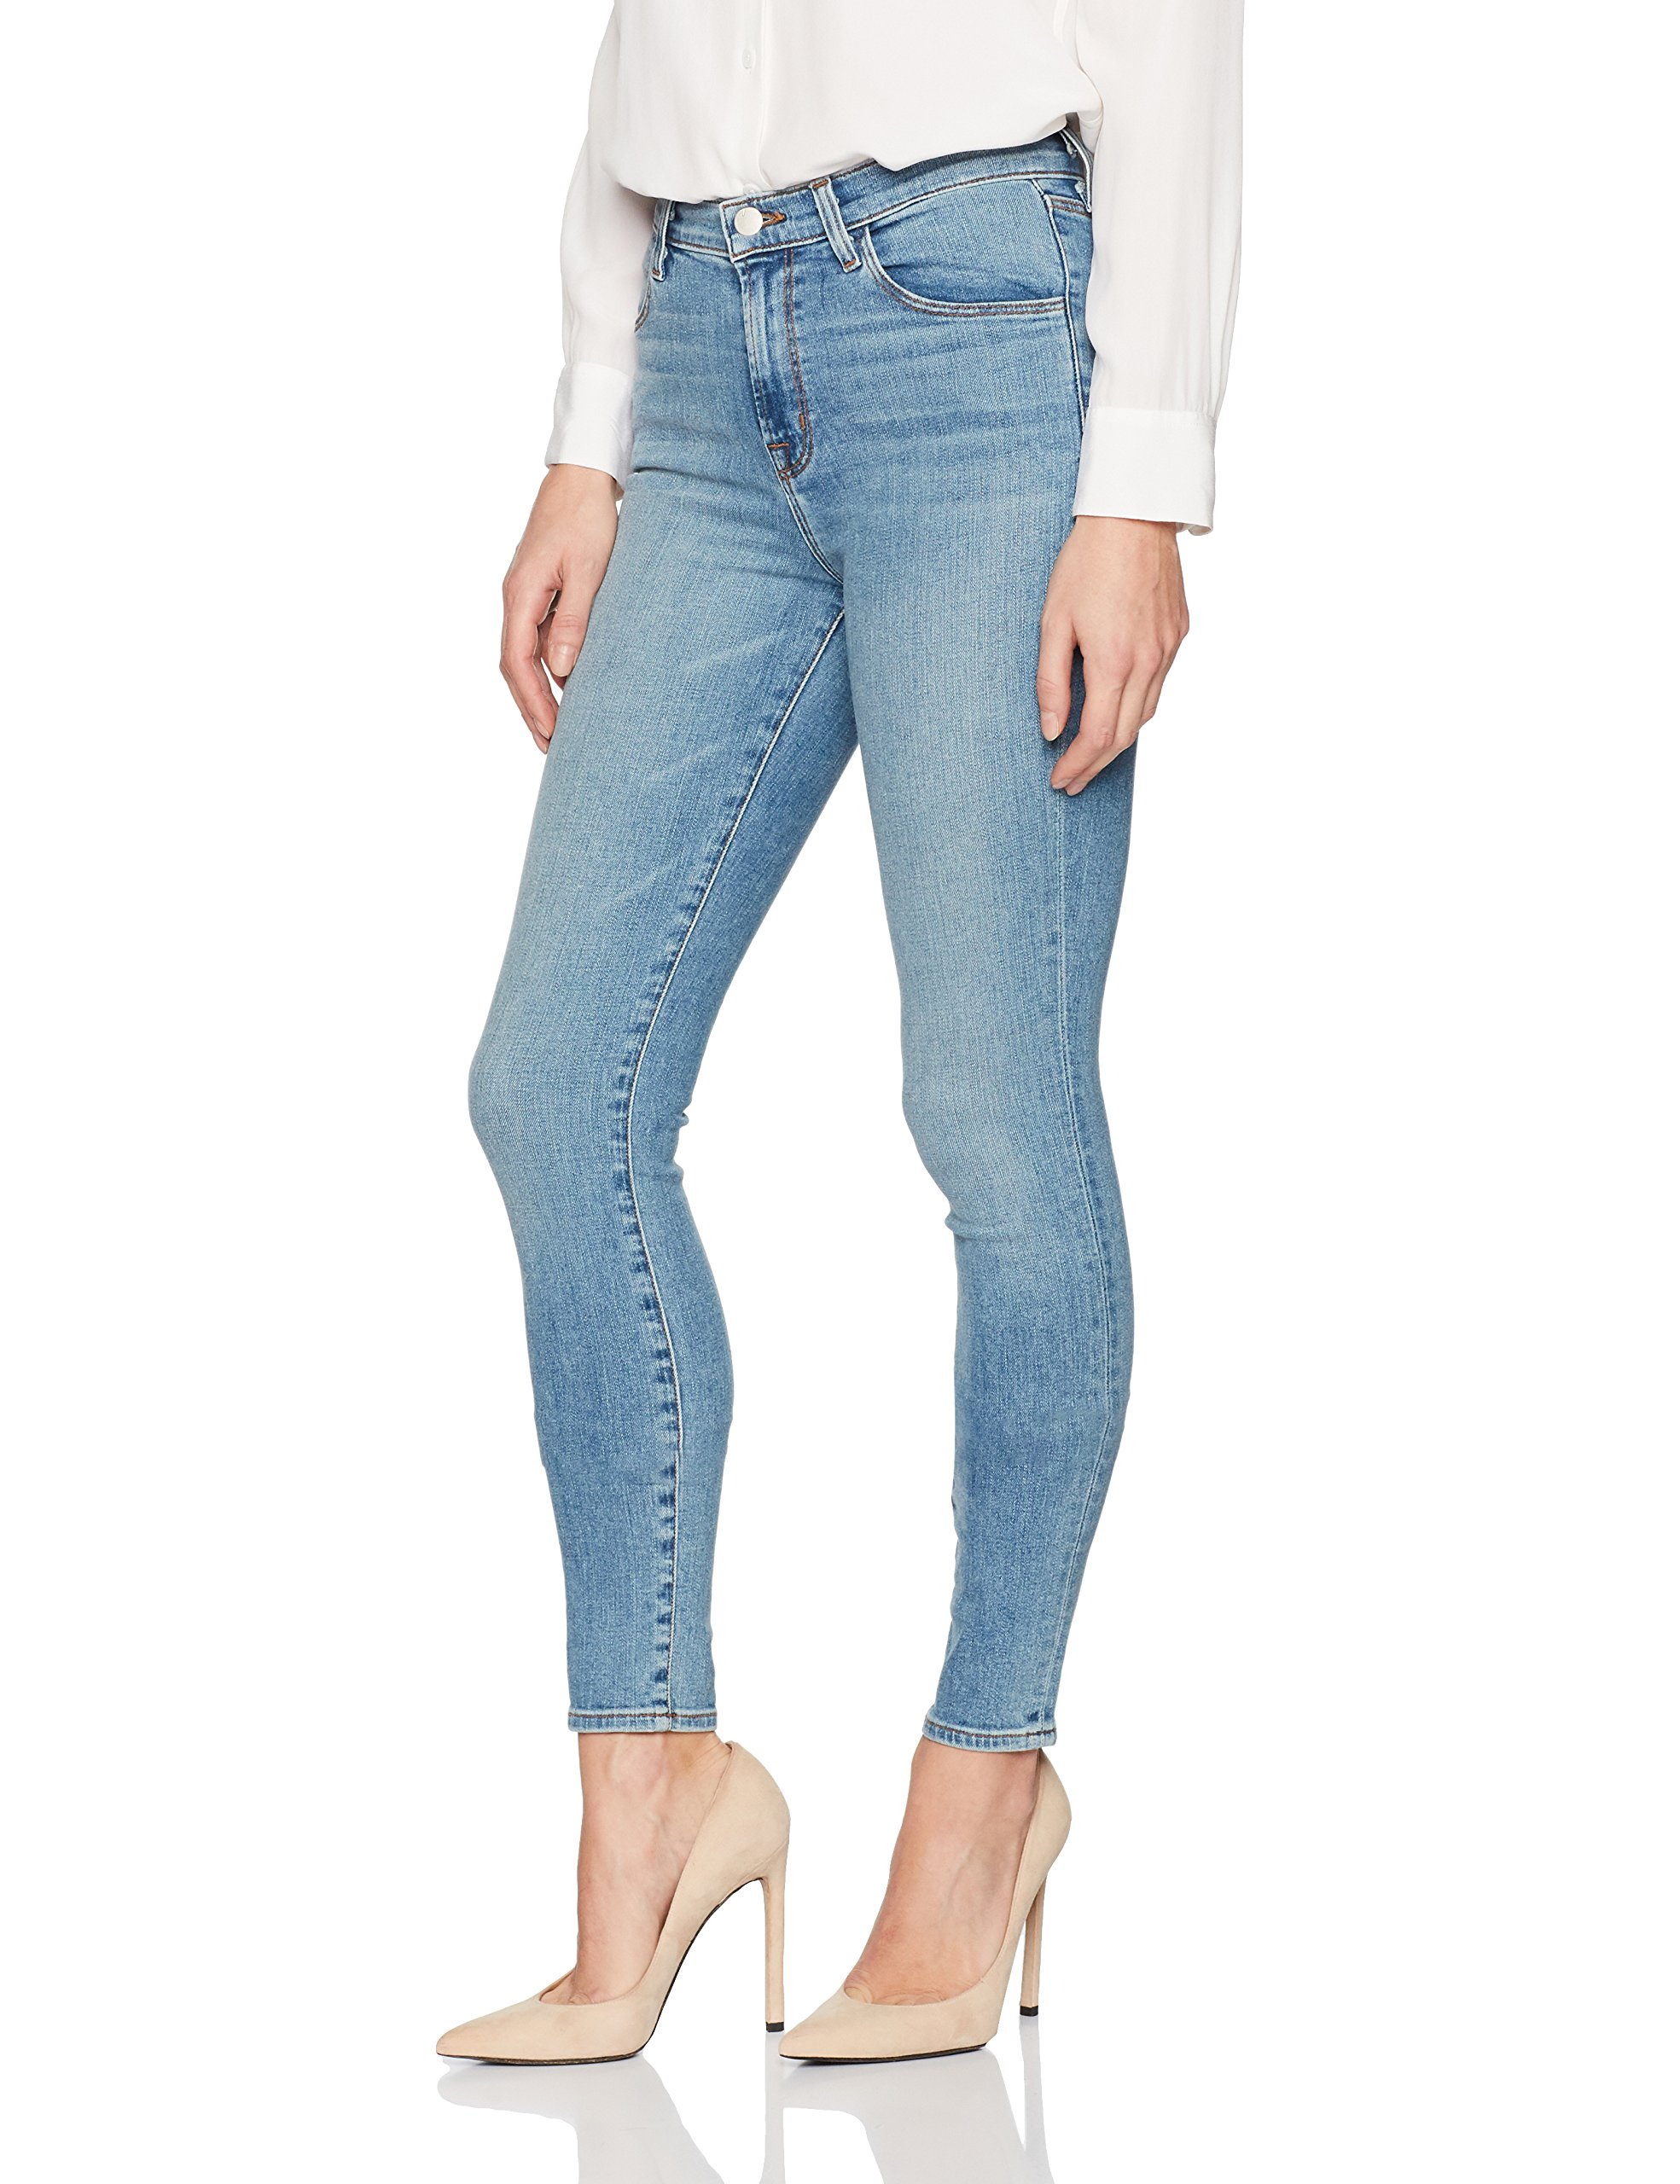 J Brand Jeans Women's Maria High Rise Skinny, Everlasting, 25